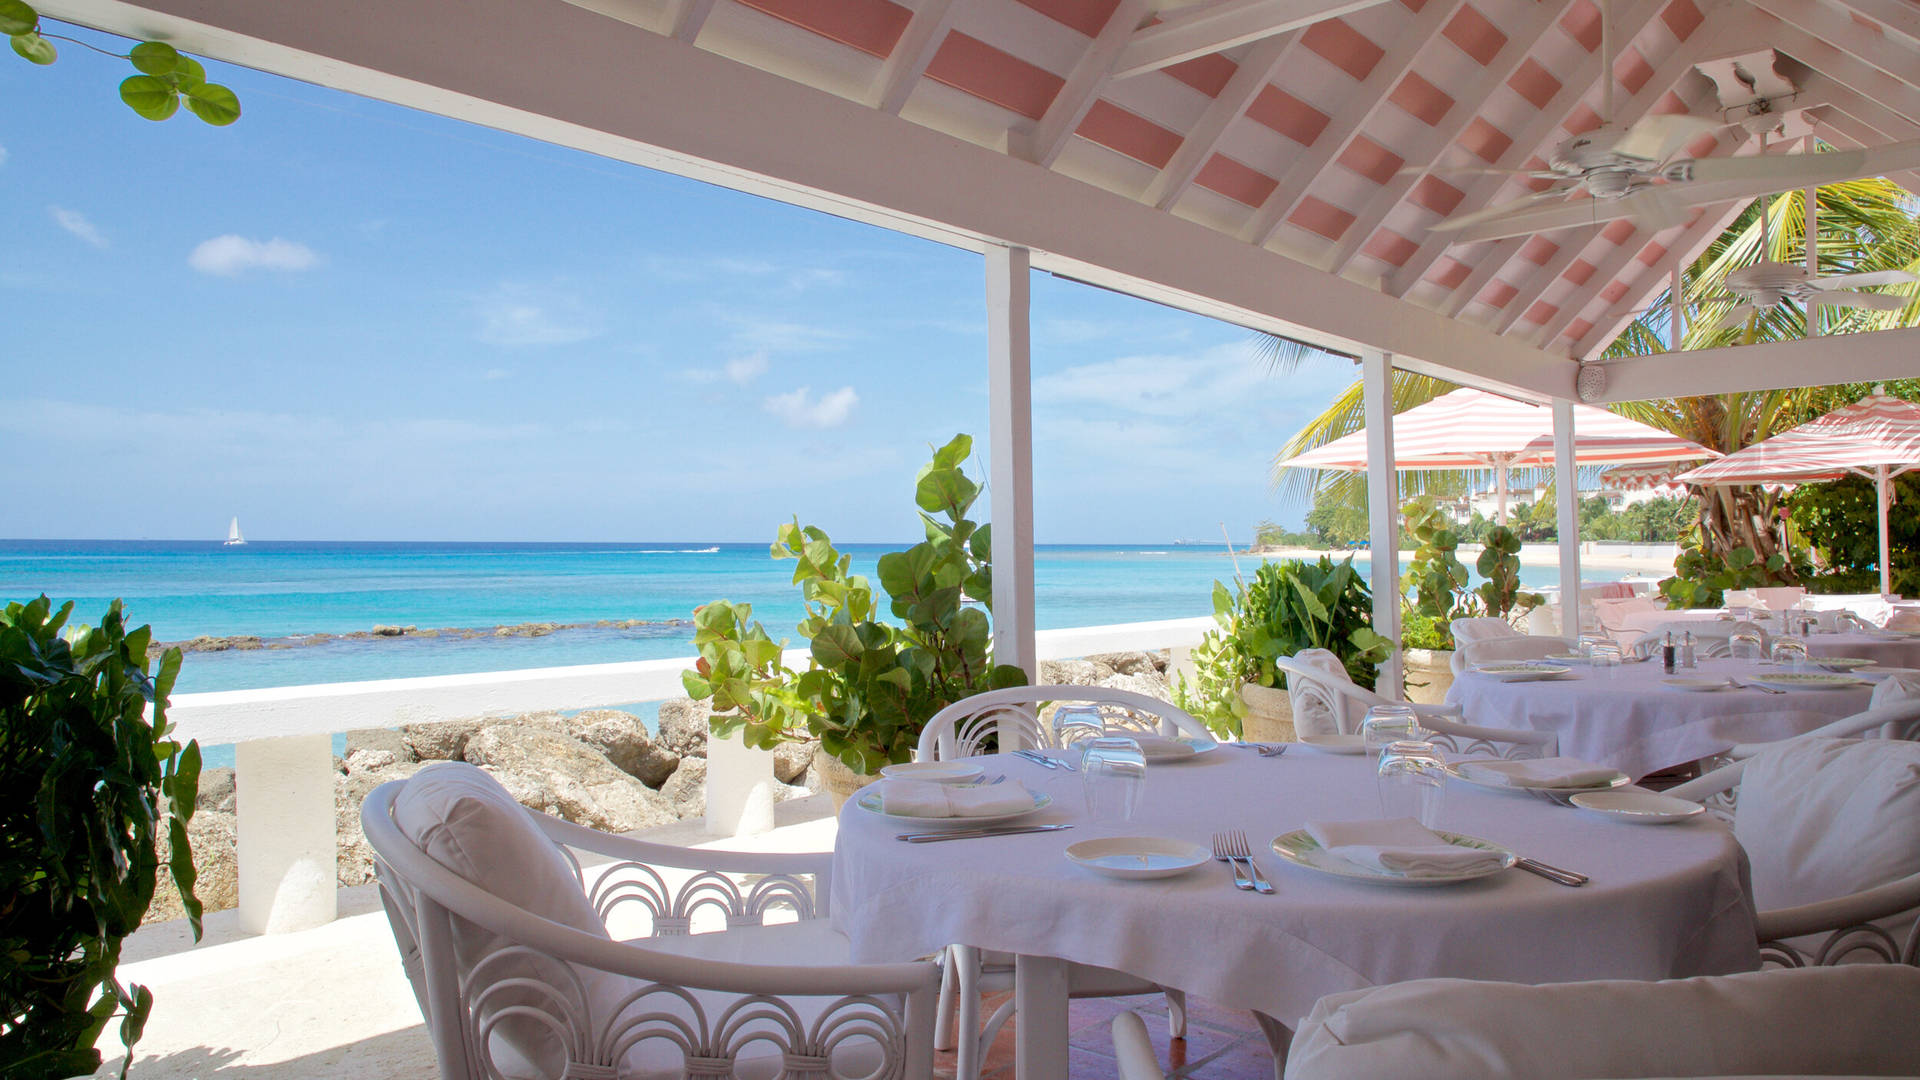 Cobblers+Cove+Camelot+Restaurant.jpeg